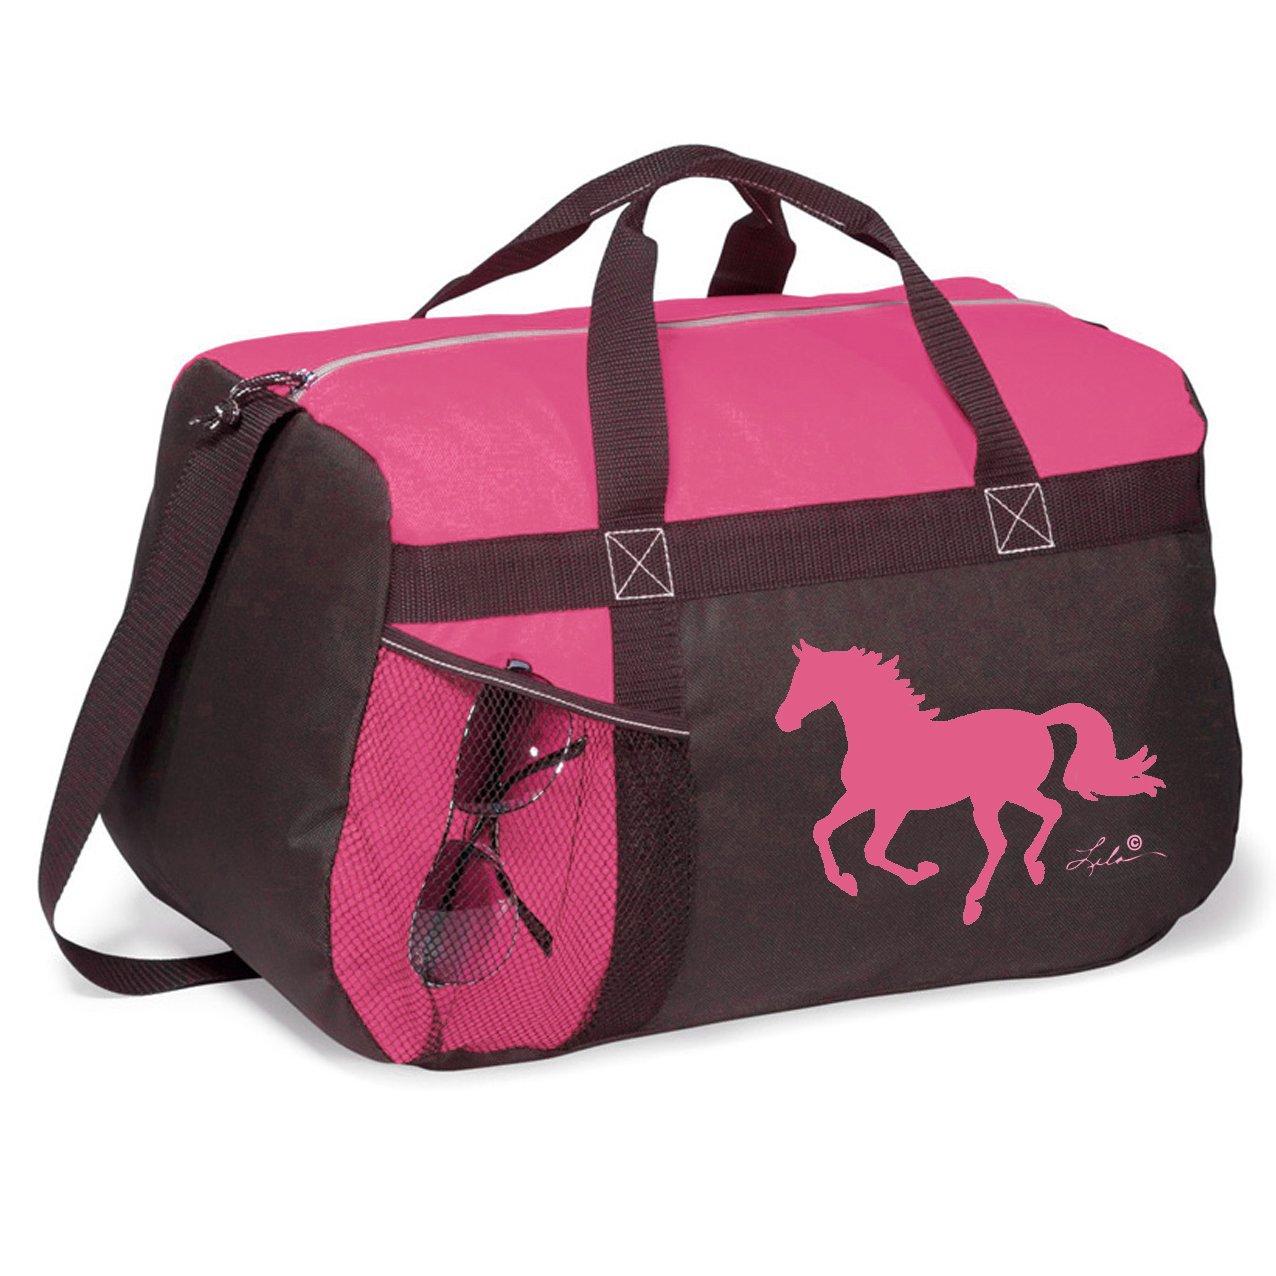 Awst Lila Helmet Duffle Bag Pink